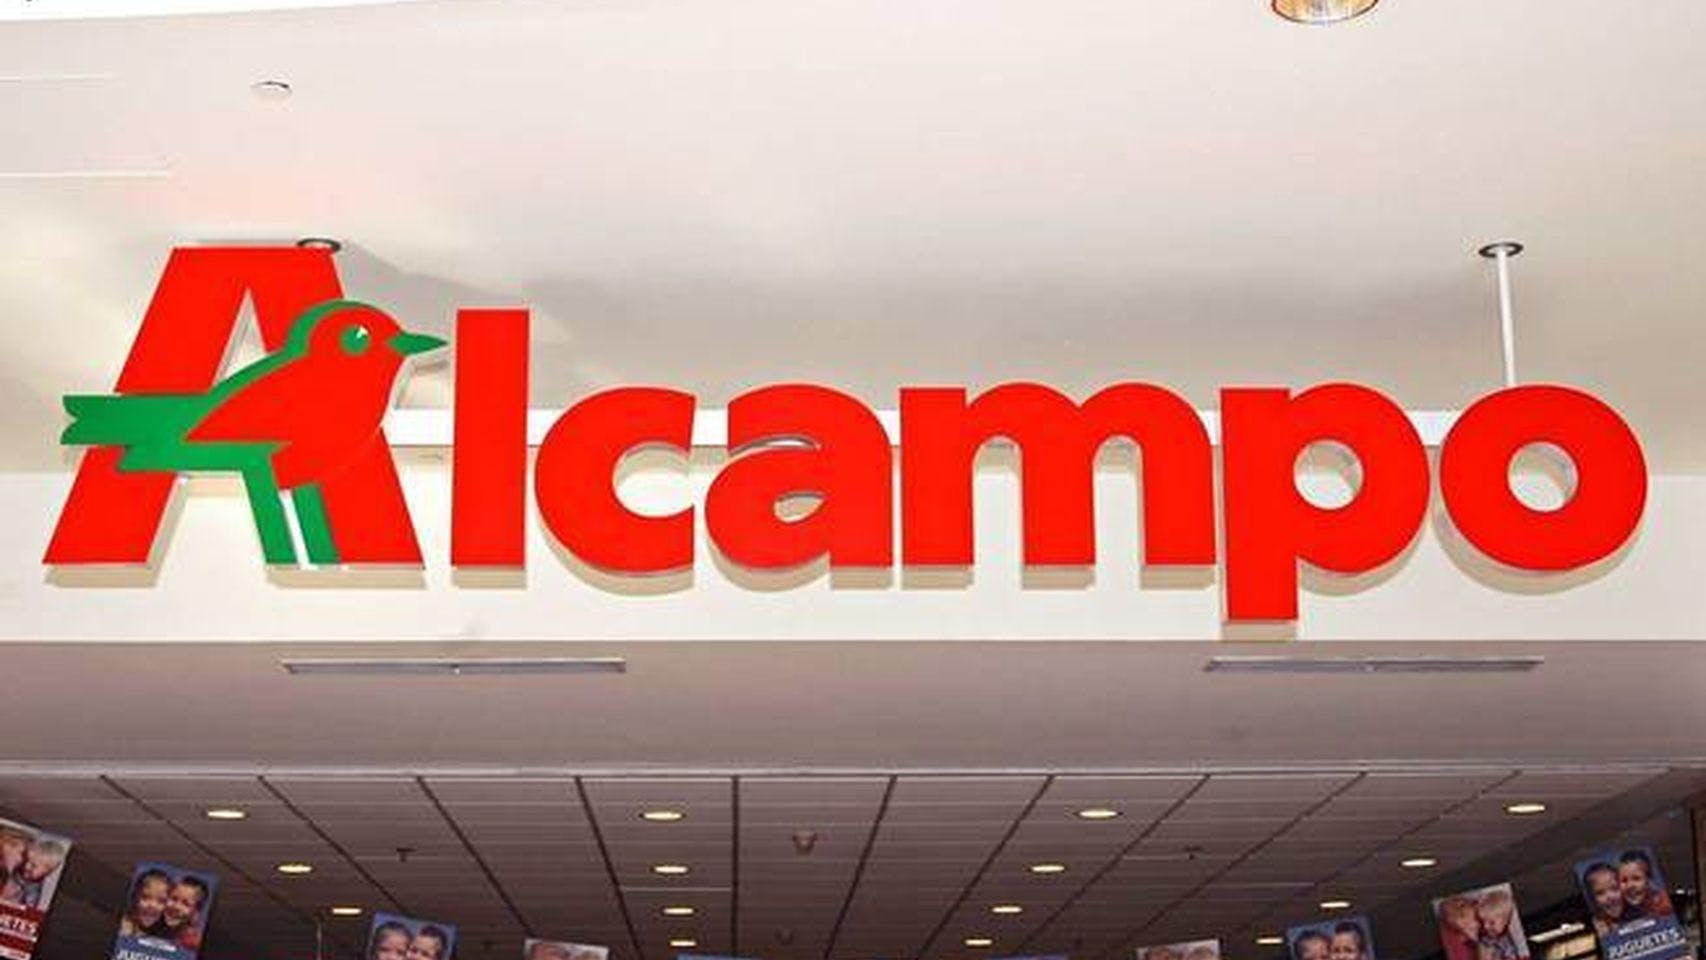 Distribucion-Alcampo-Supermercados-Empresas_279736187_62173569_1706x960